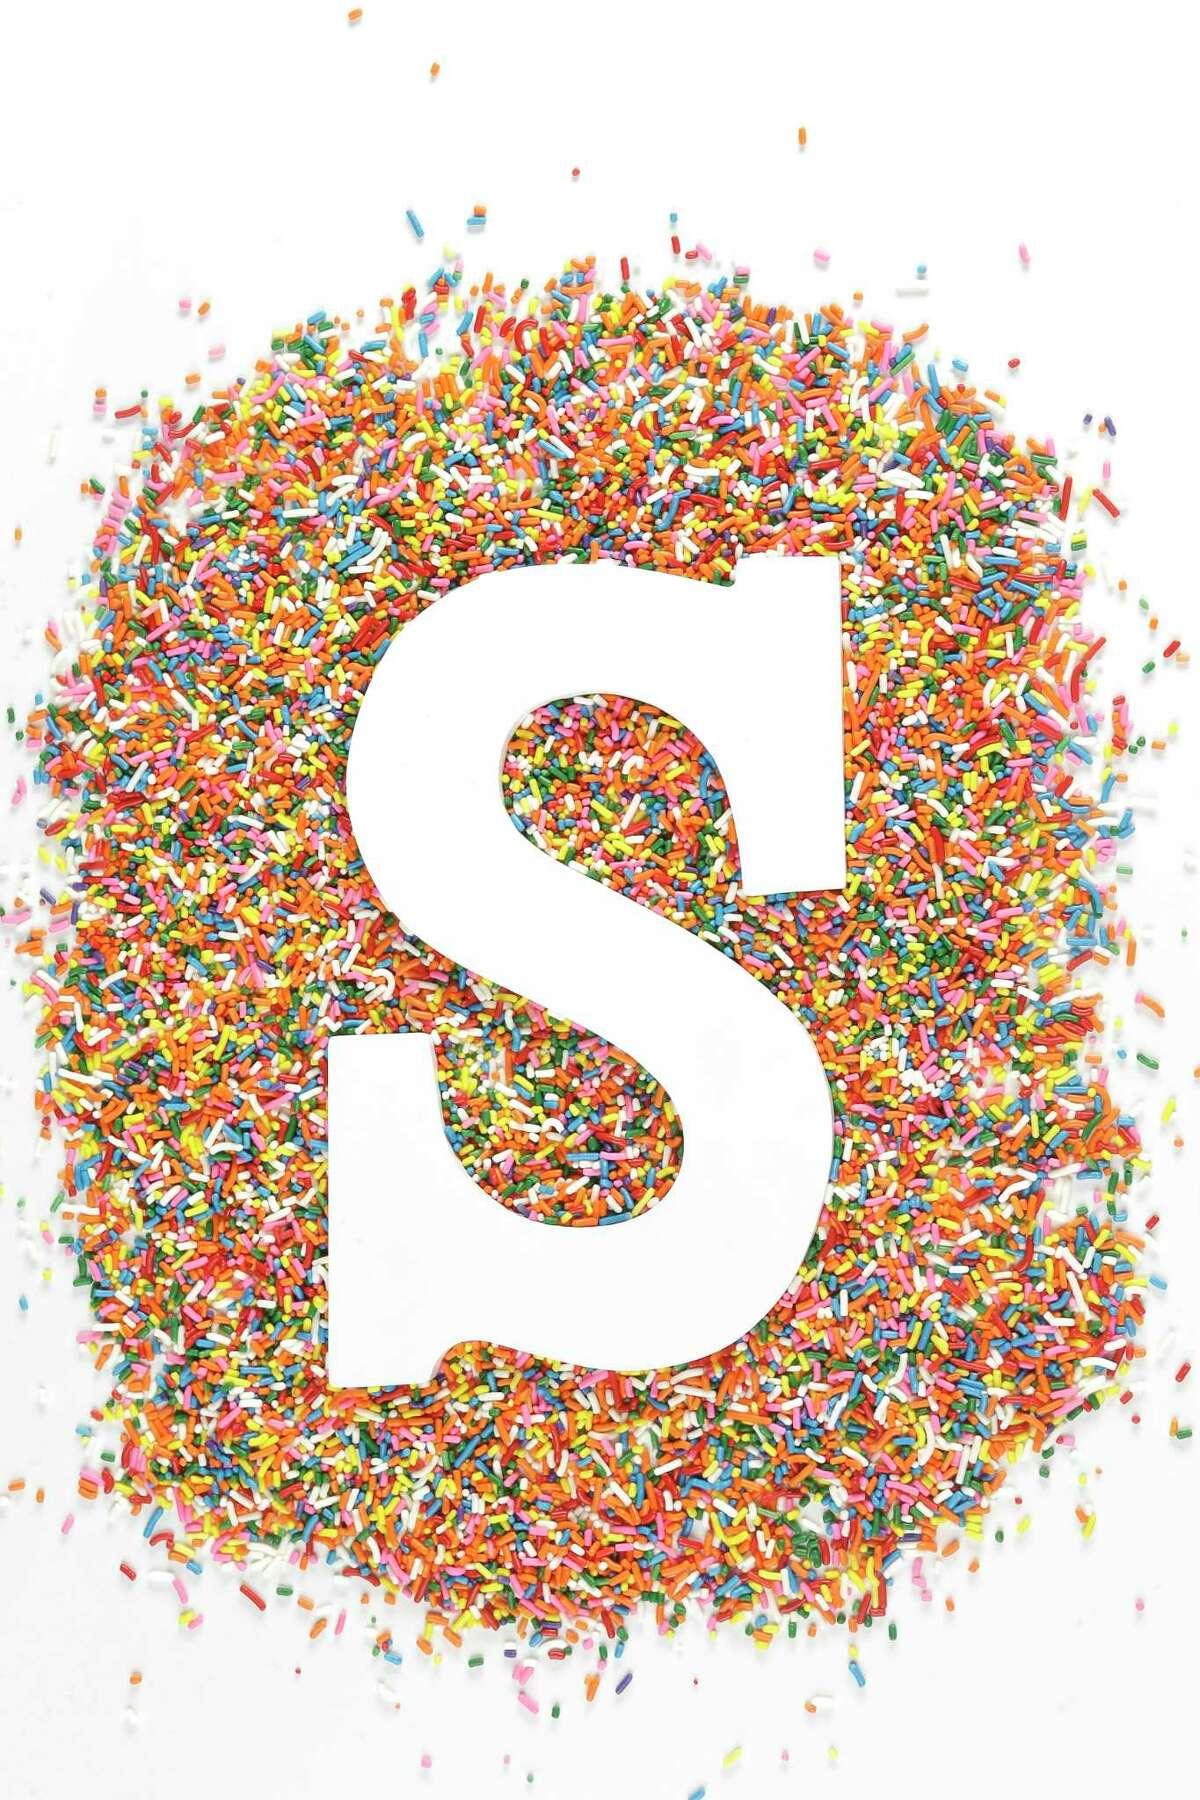 Sprinkles are shown Wednesday, Aug. 23, 2017, in Houston. ( Melissa Phillip / Houston Chronicle )